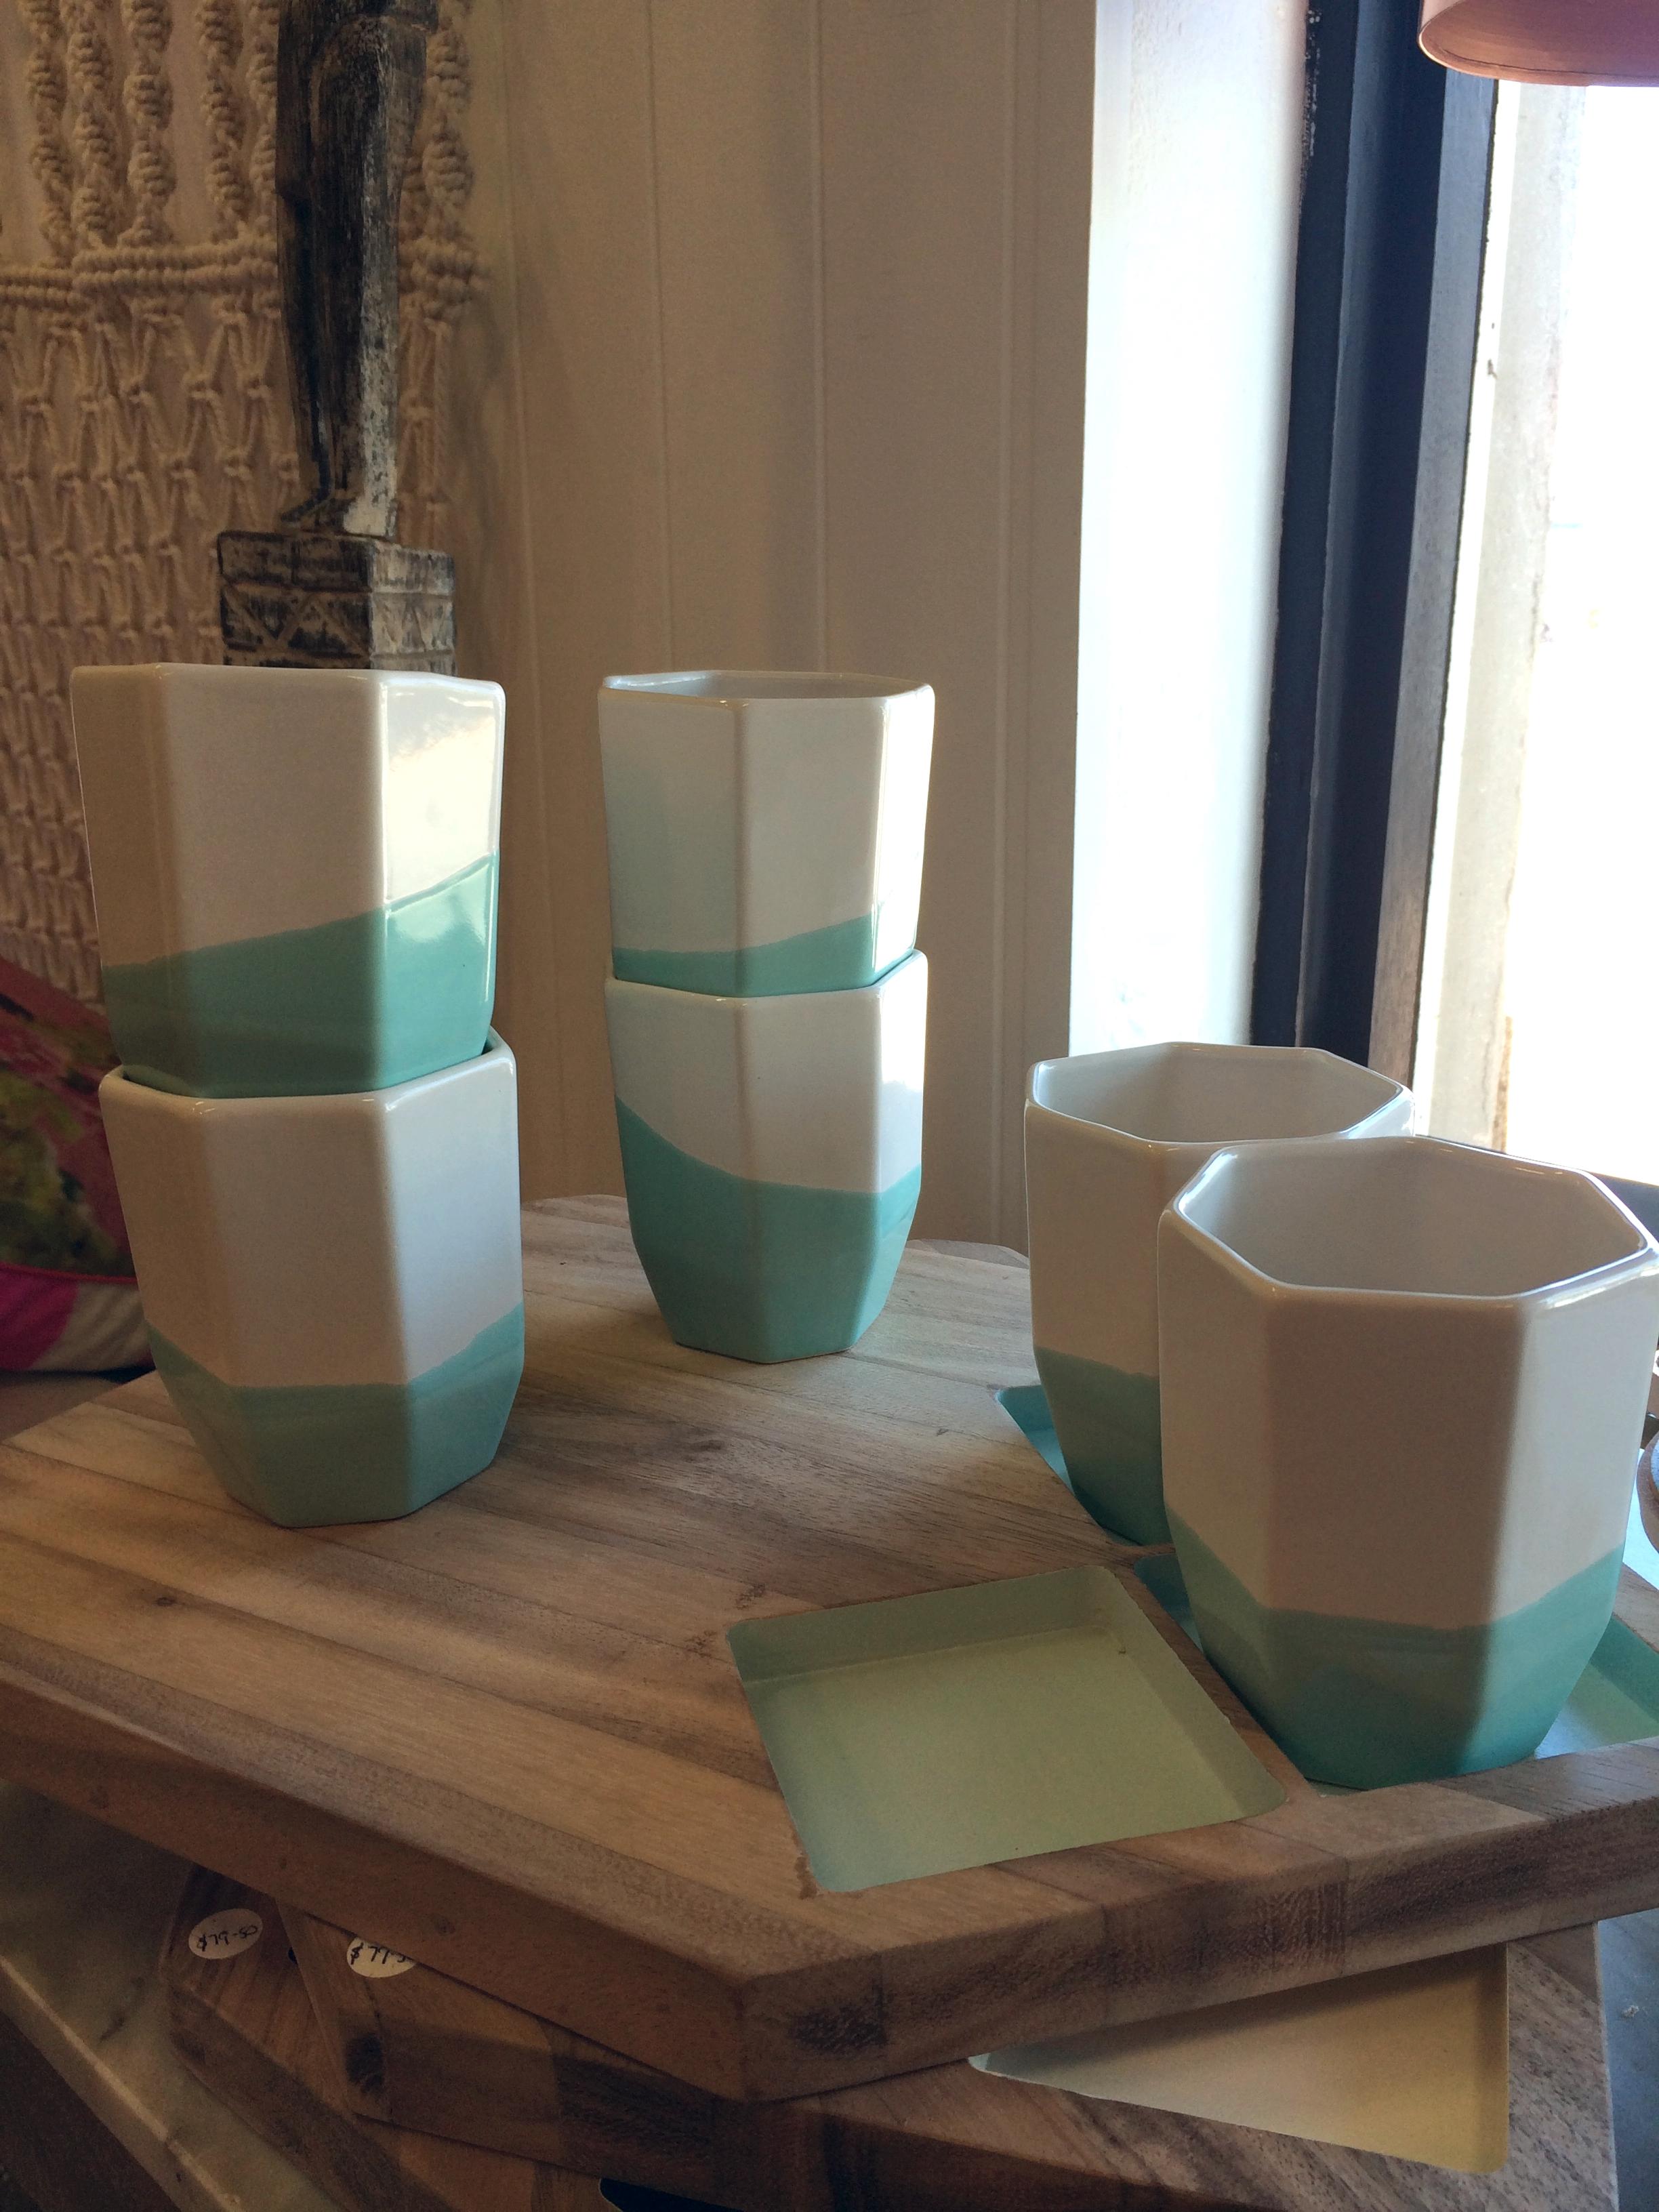 Ceramic cups - Milton - Shopping in NSW Australia